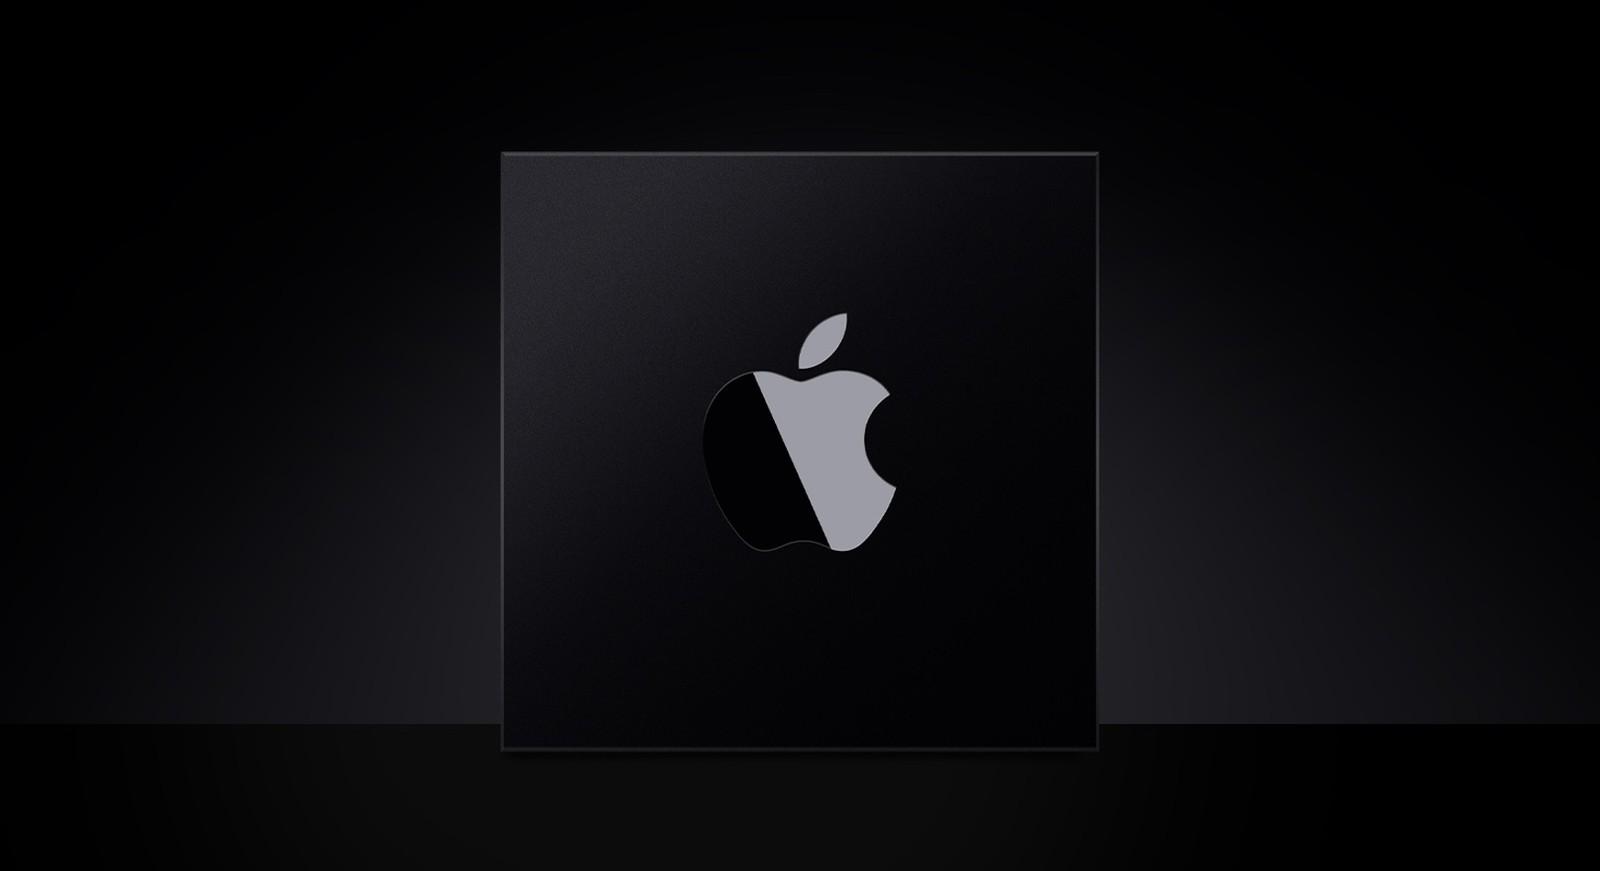 Apple Siicon